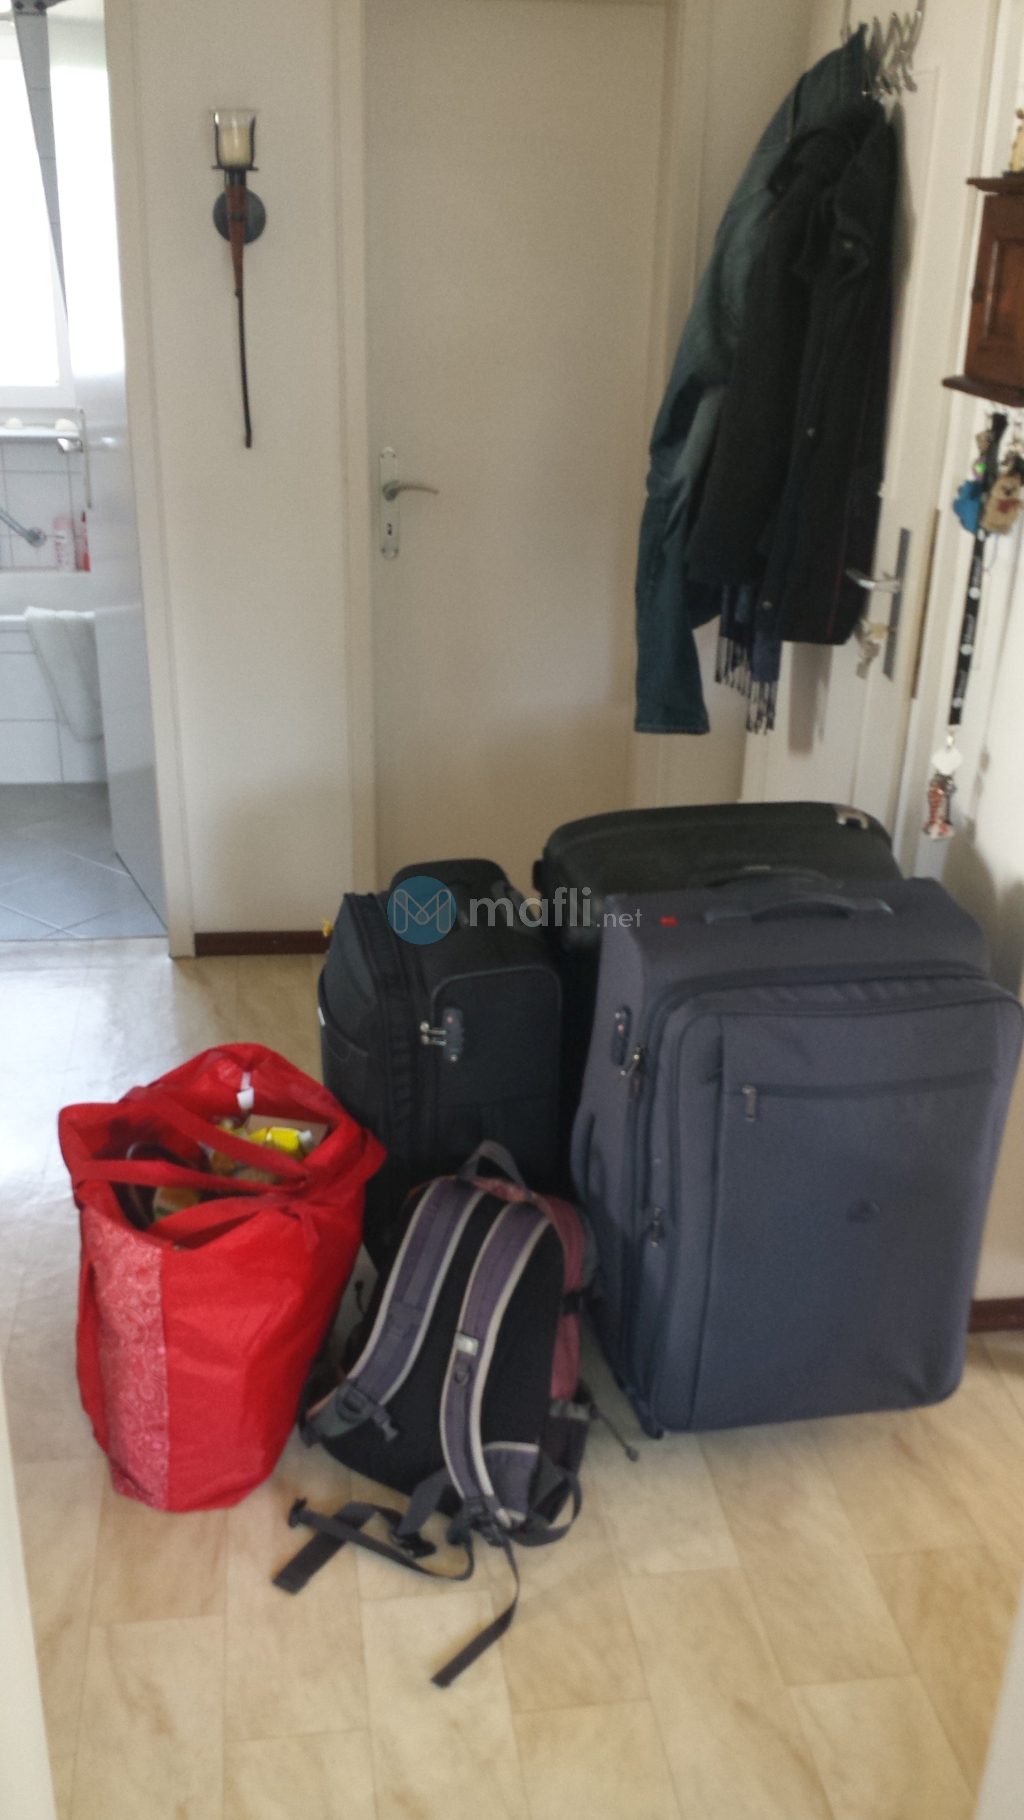 Unser komplettes Reisegepäck